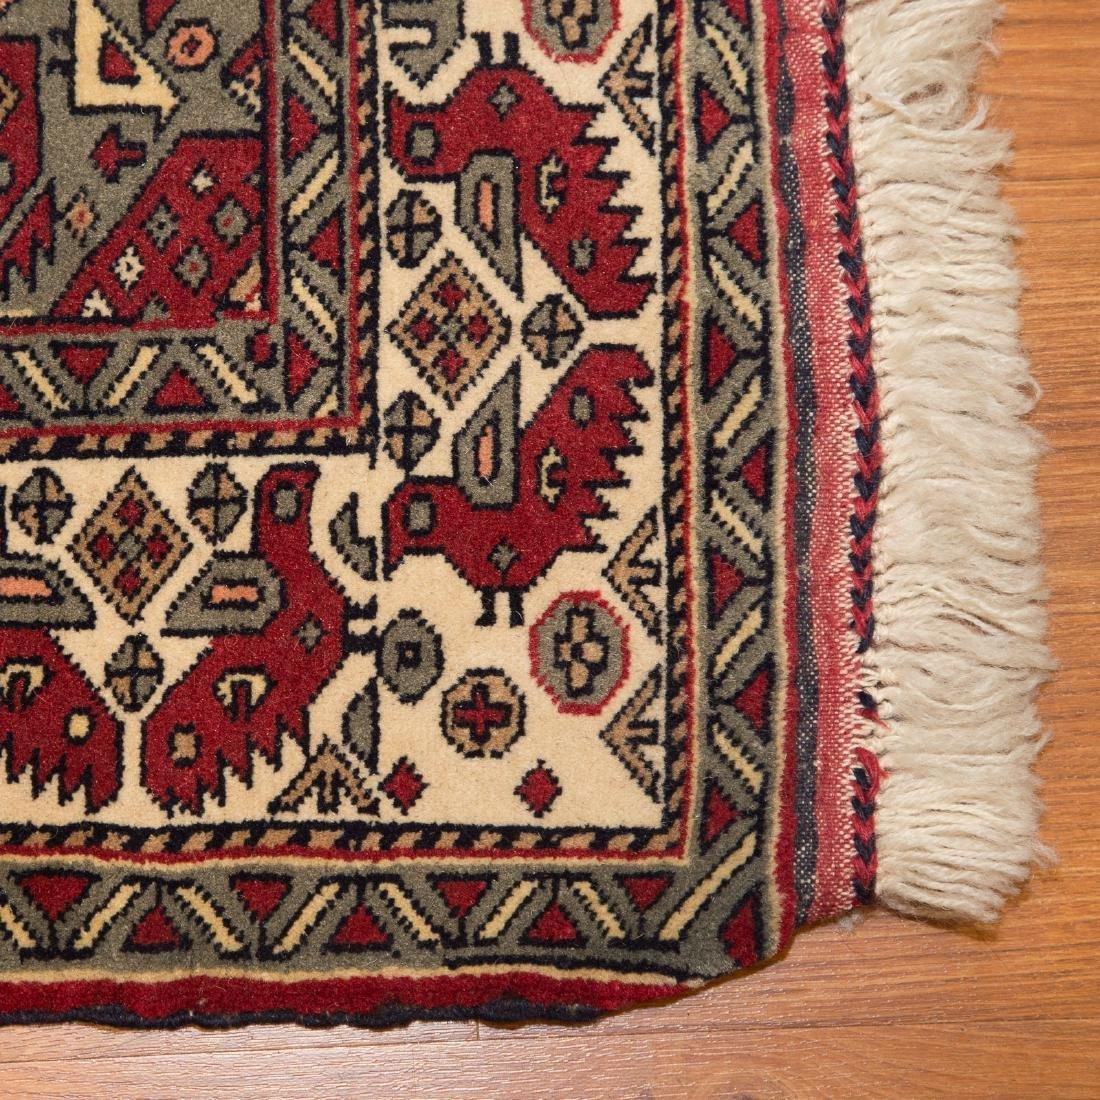 Persian Turkemon rug, approx. 3.7 x 4.3 - 2